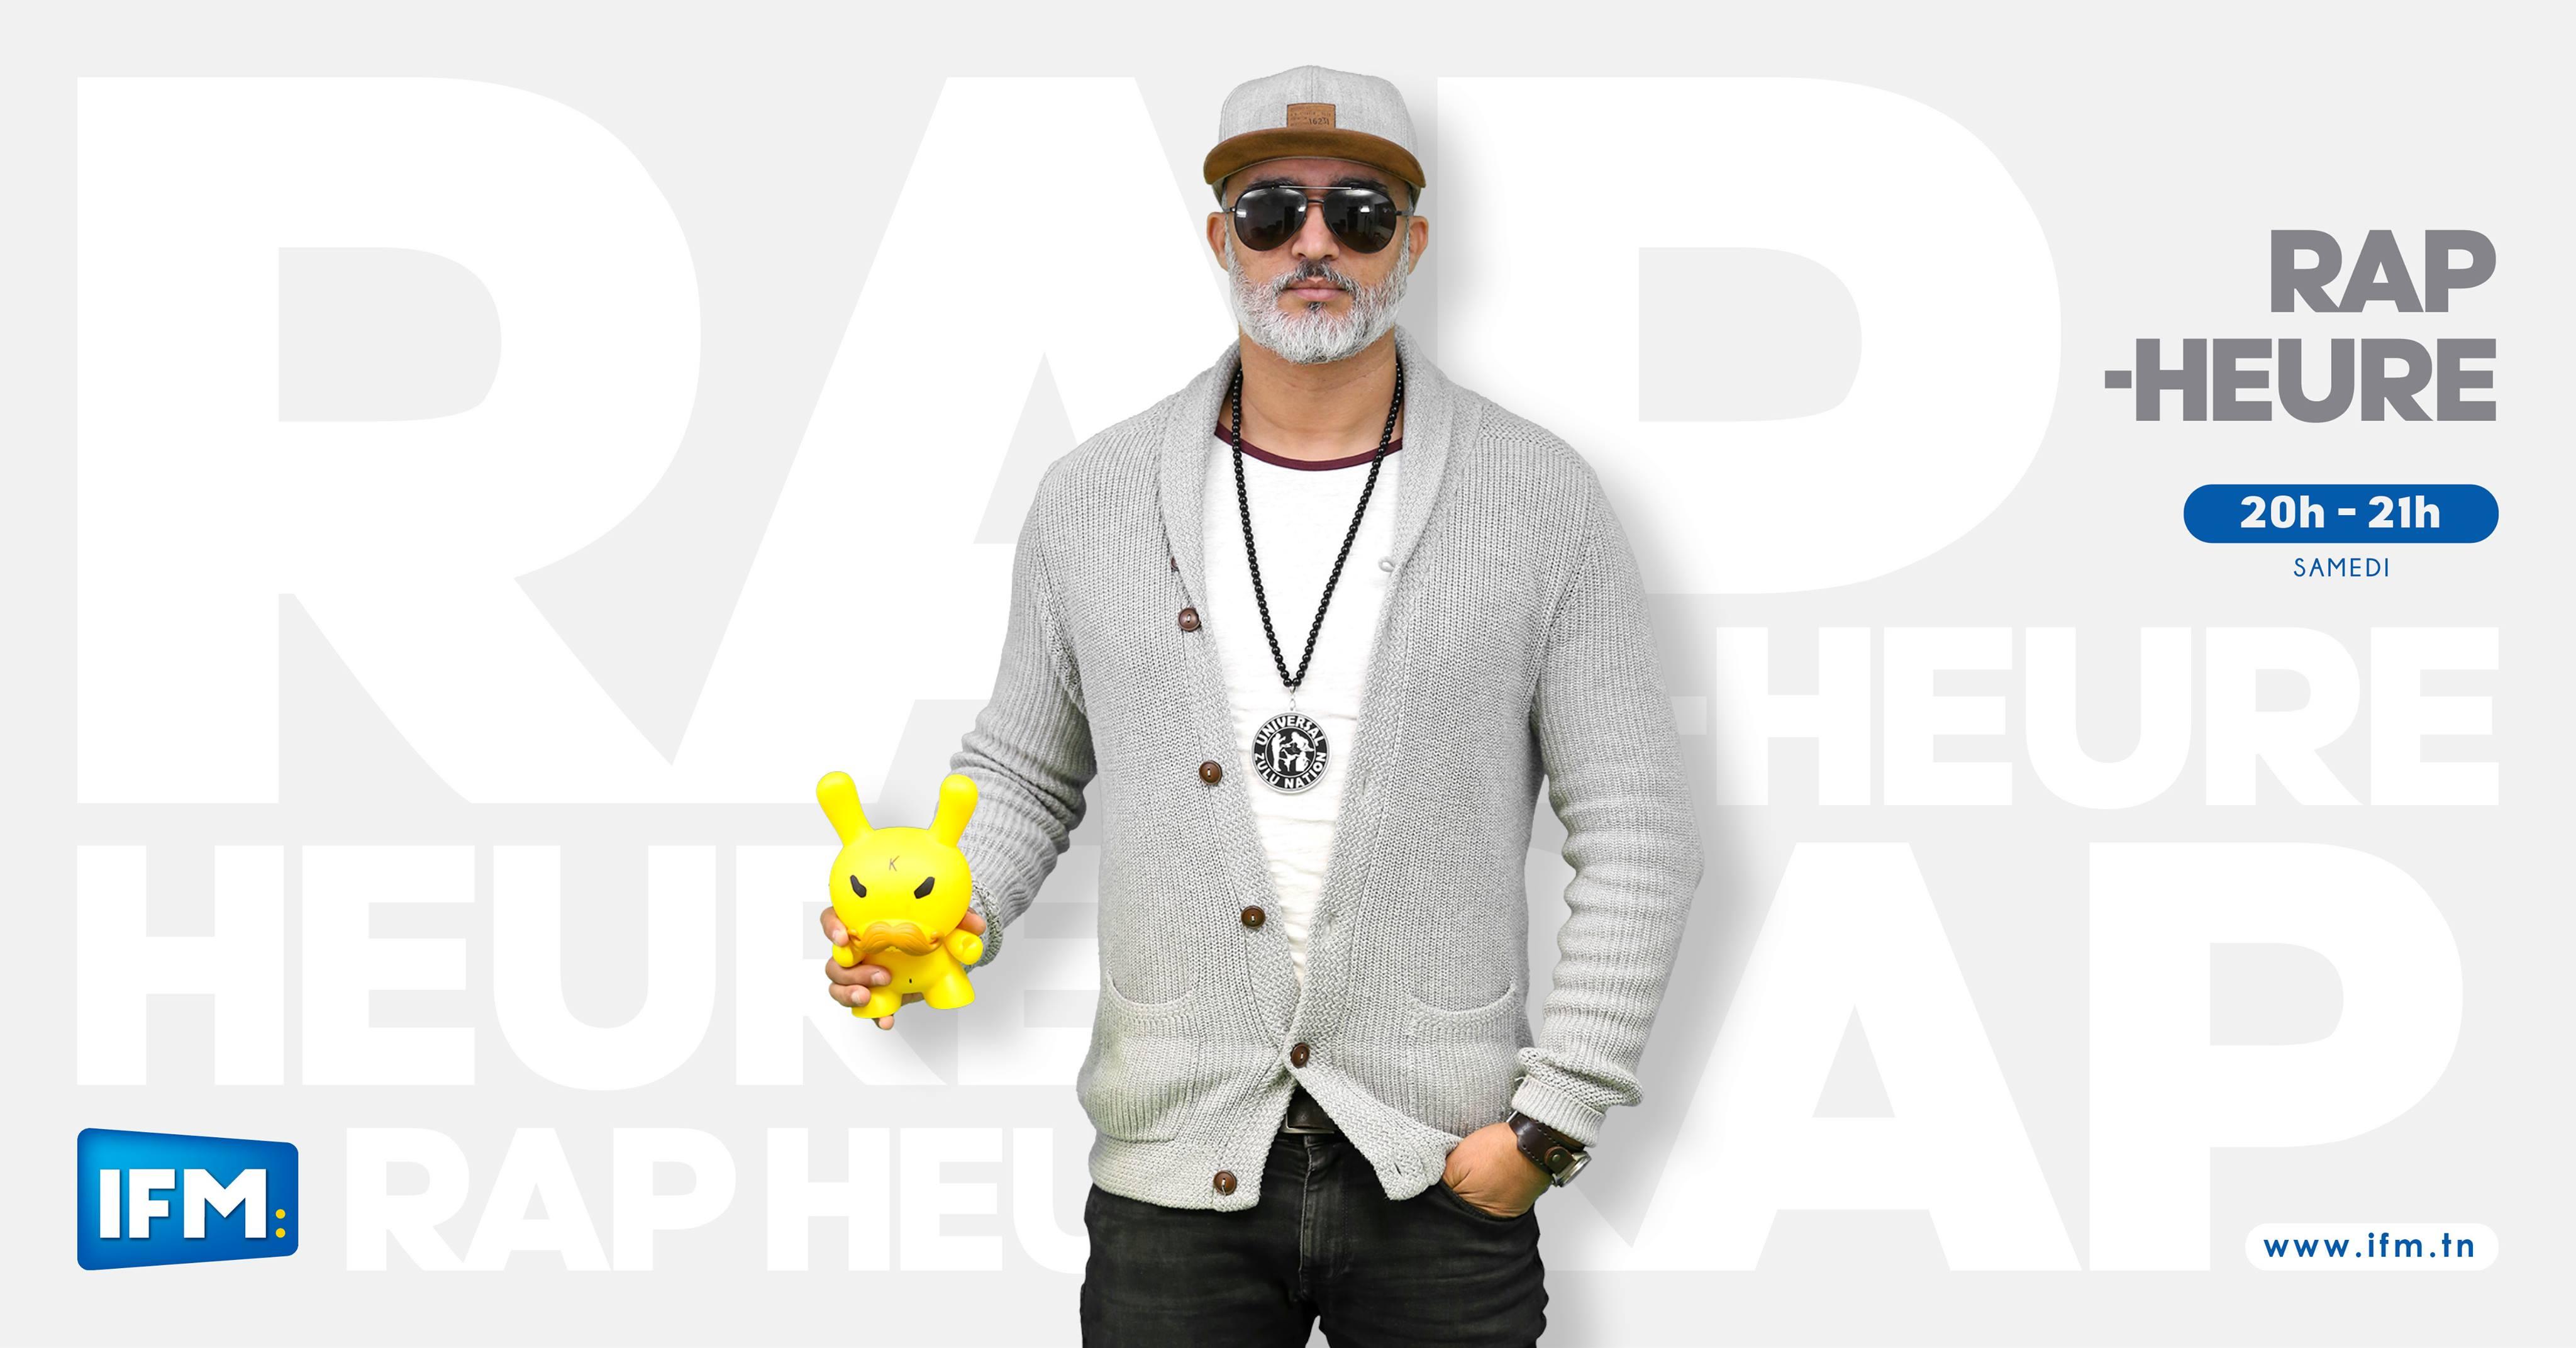 Rap Heure